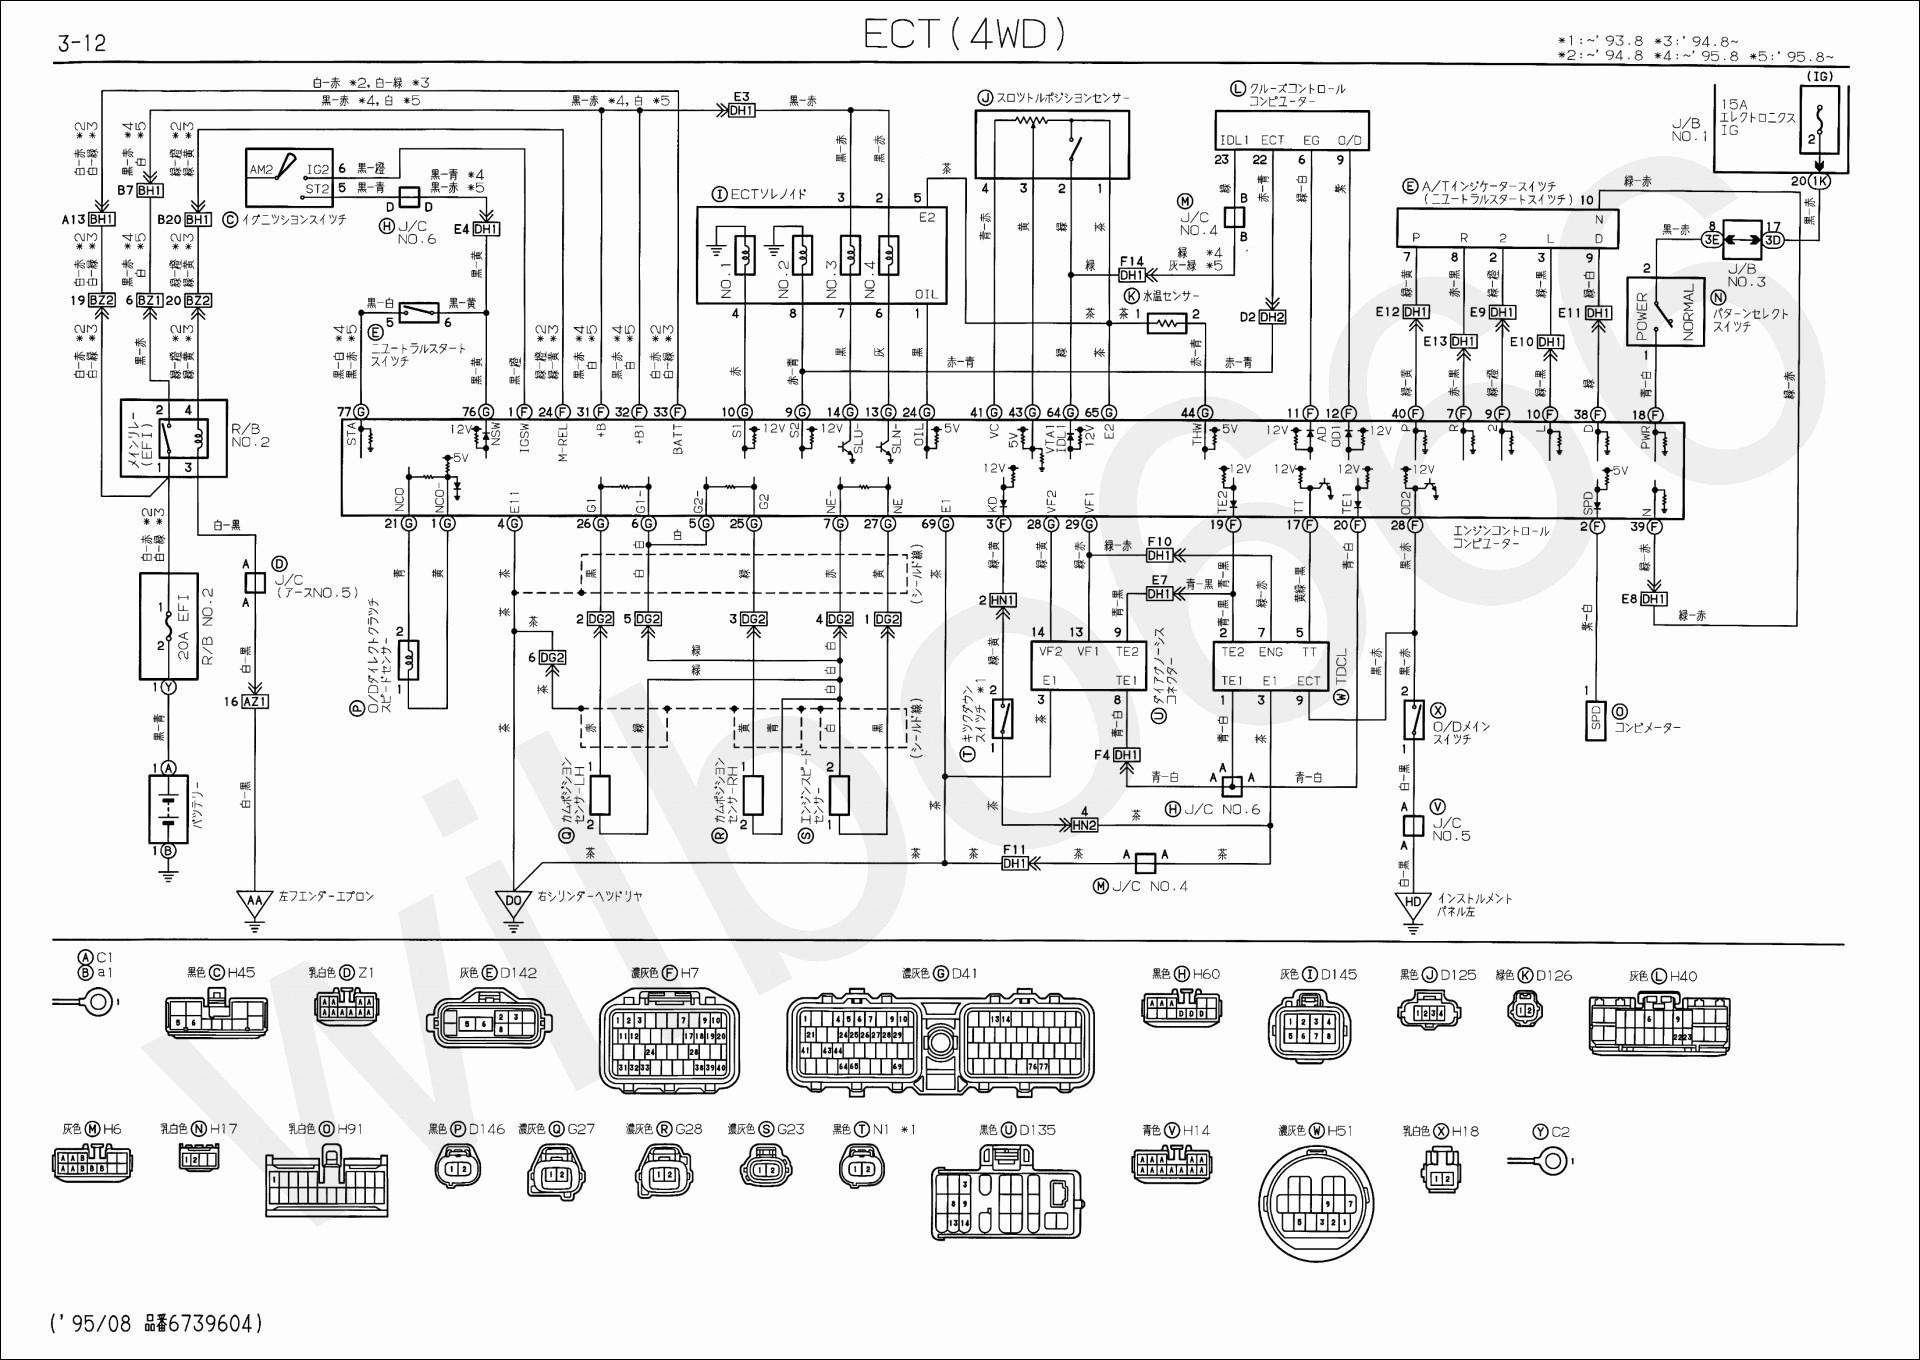 Labeled Engine Diagram Wiring Diagram No Best toyota Alternator Wiring Diagram Beautiful Of Labeled Engine Diagram